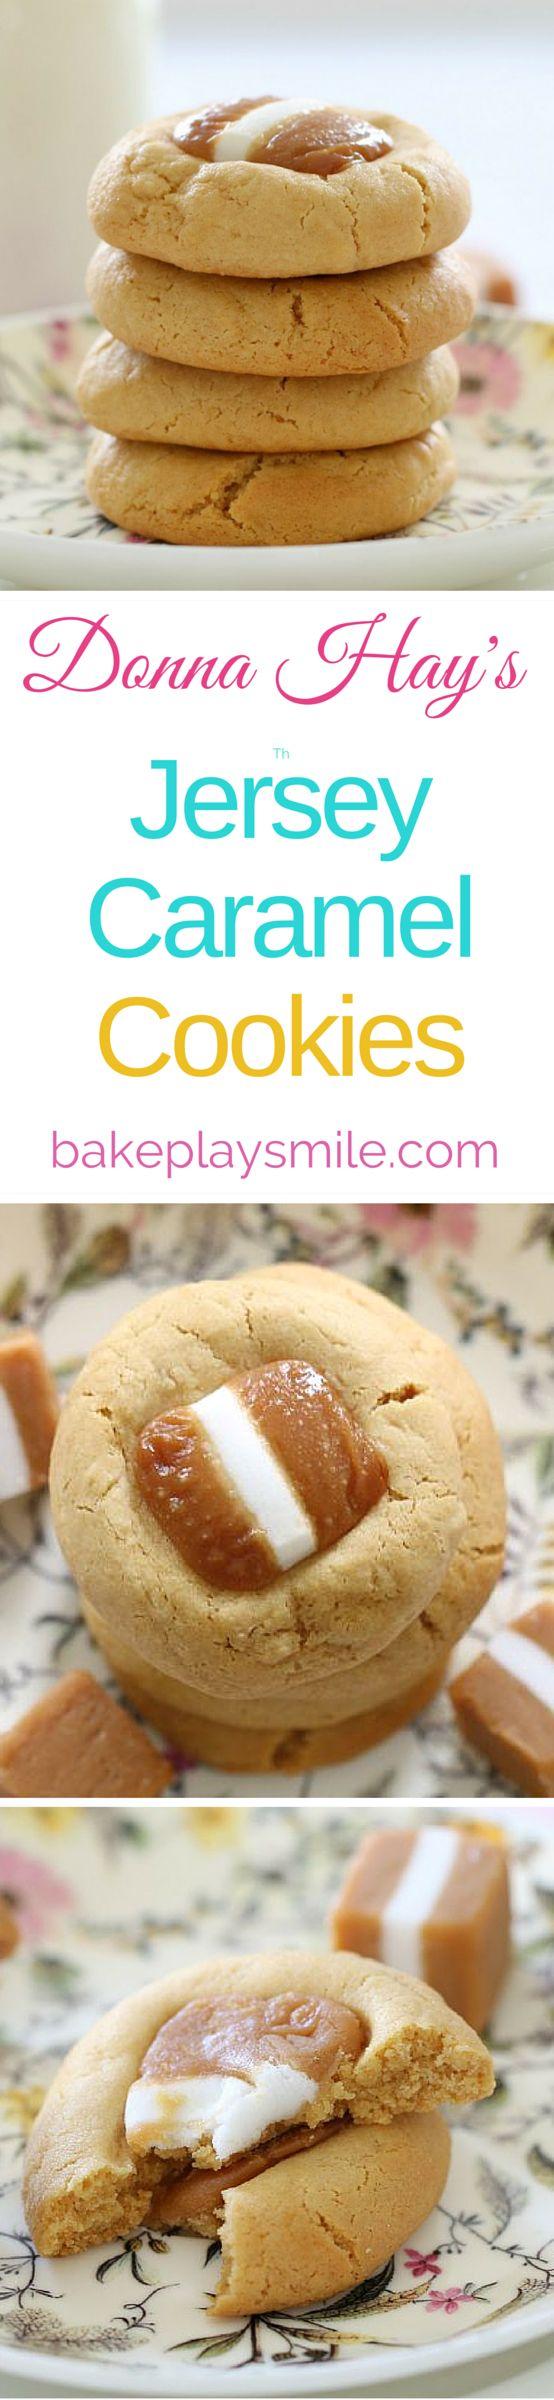 Donna Hay - Jersey Caramel Cookies